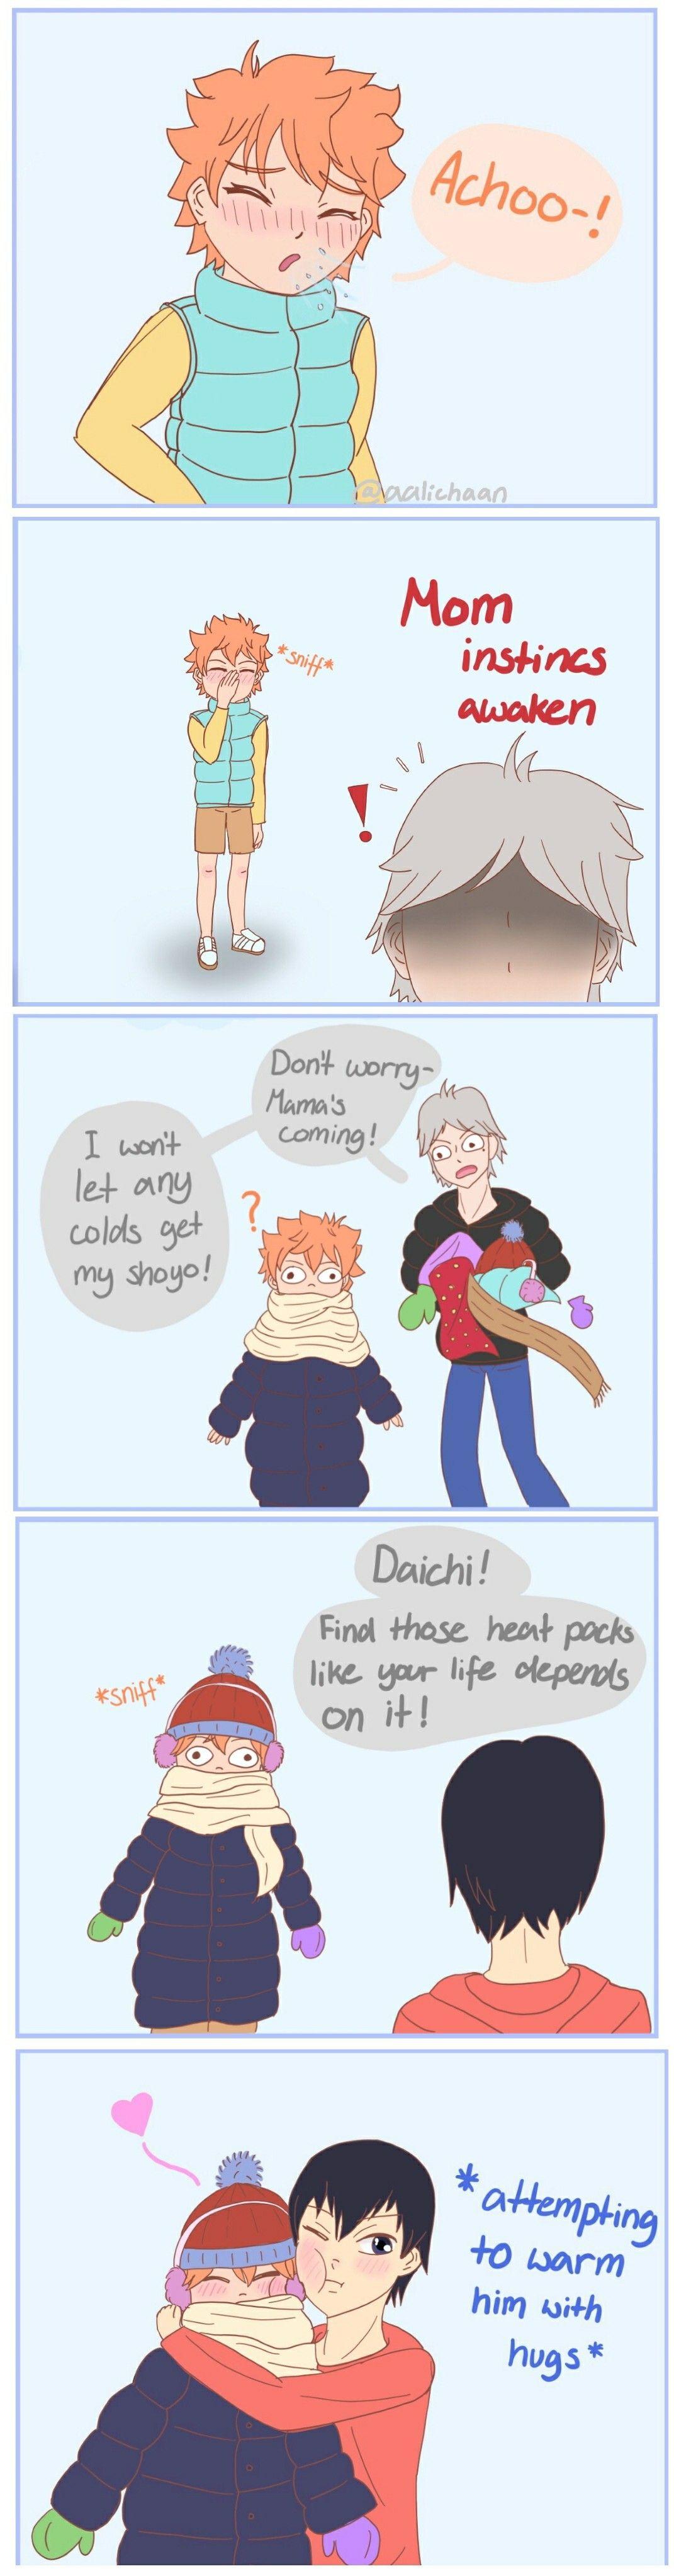 Warmth of Love #haikyuu #haikyuufanart #comic #manga #tumblr #kagehina #kageyama #hinata #sugawara #sawamura #anime #haikyuudoujinshi